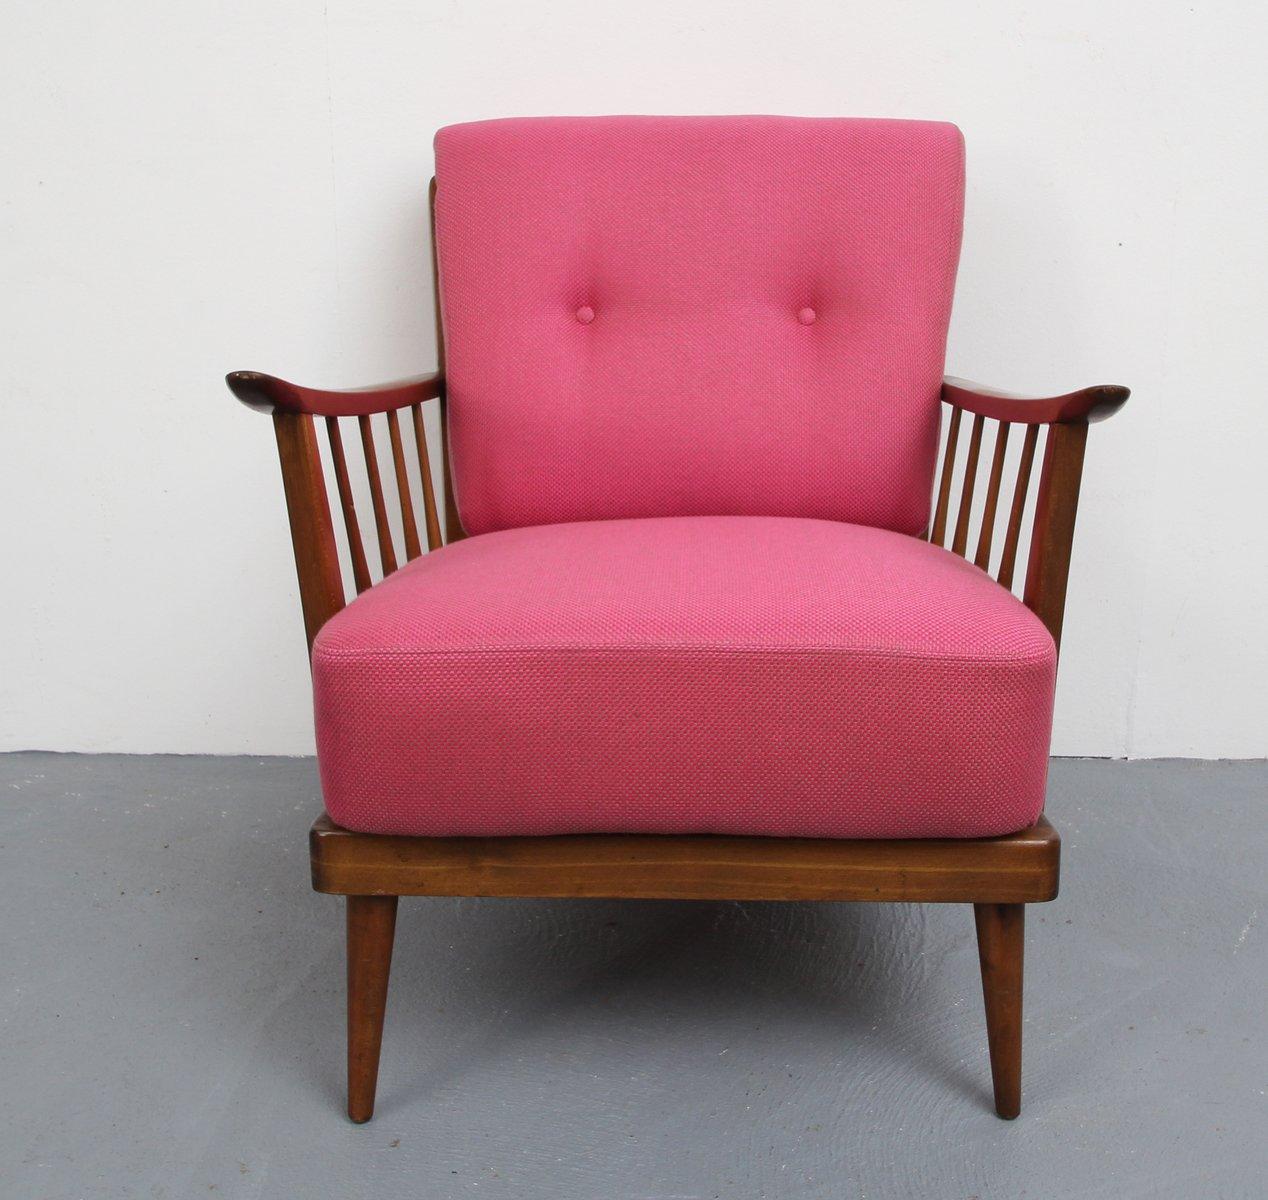 Wonderful Pink Armchair, 1950s